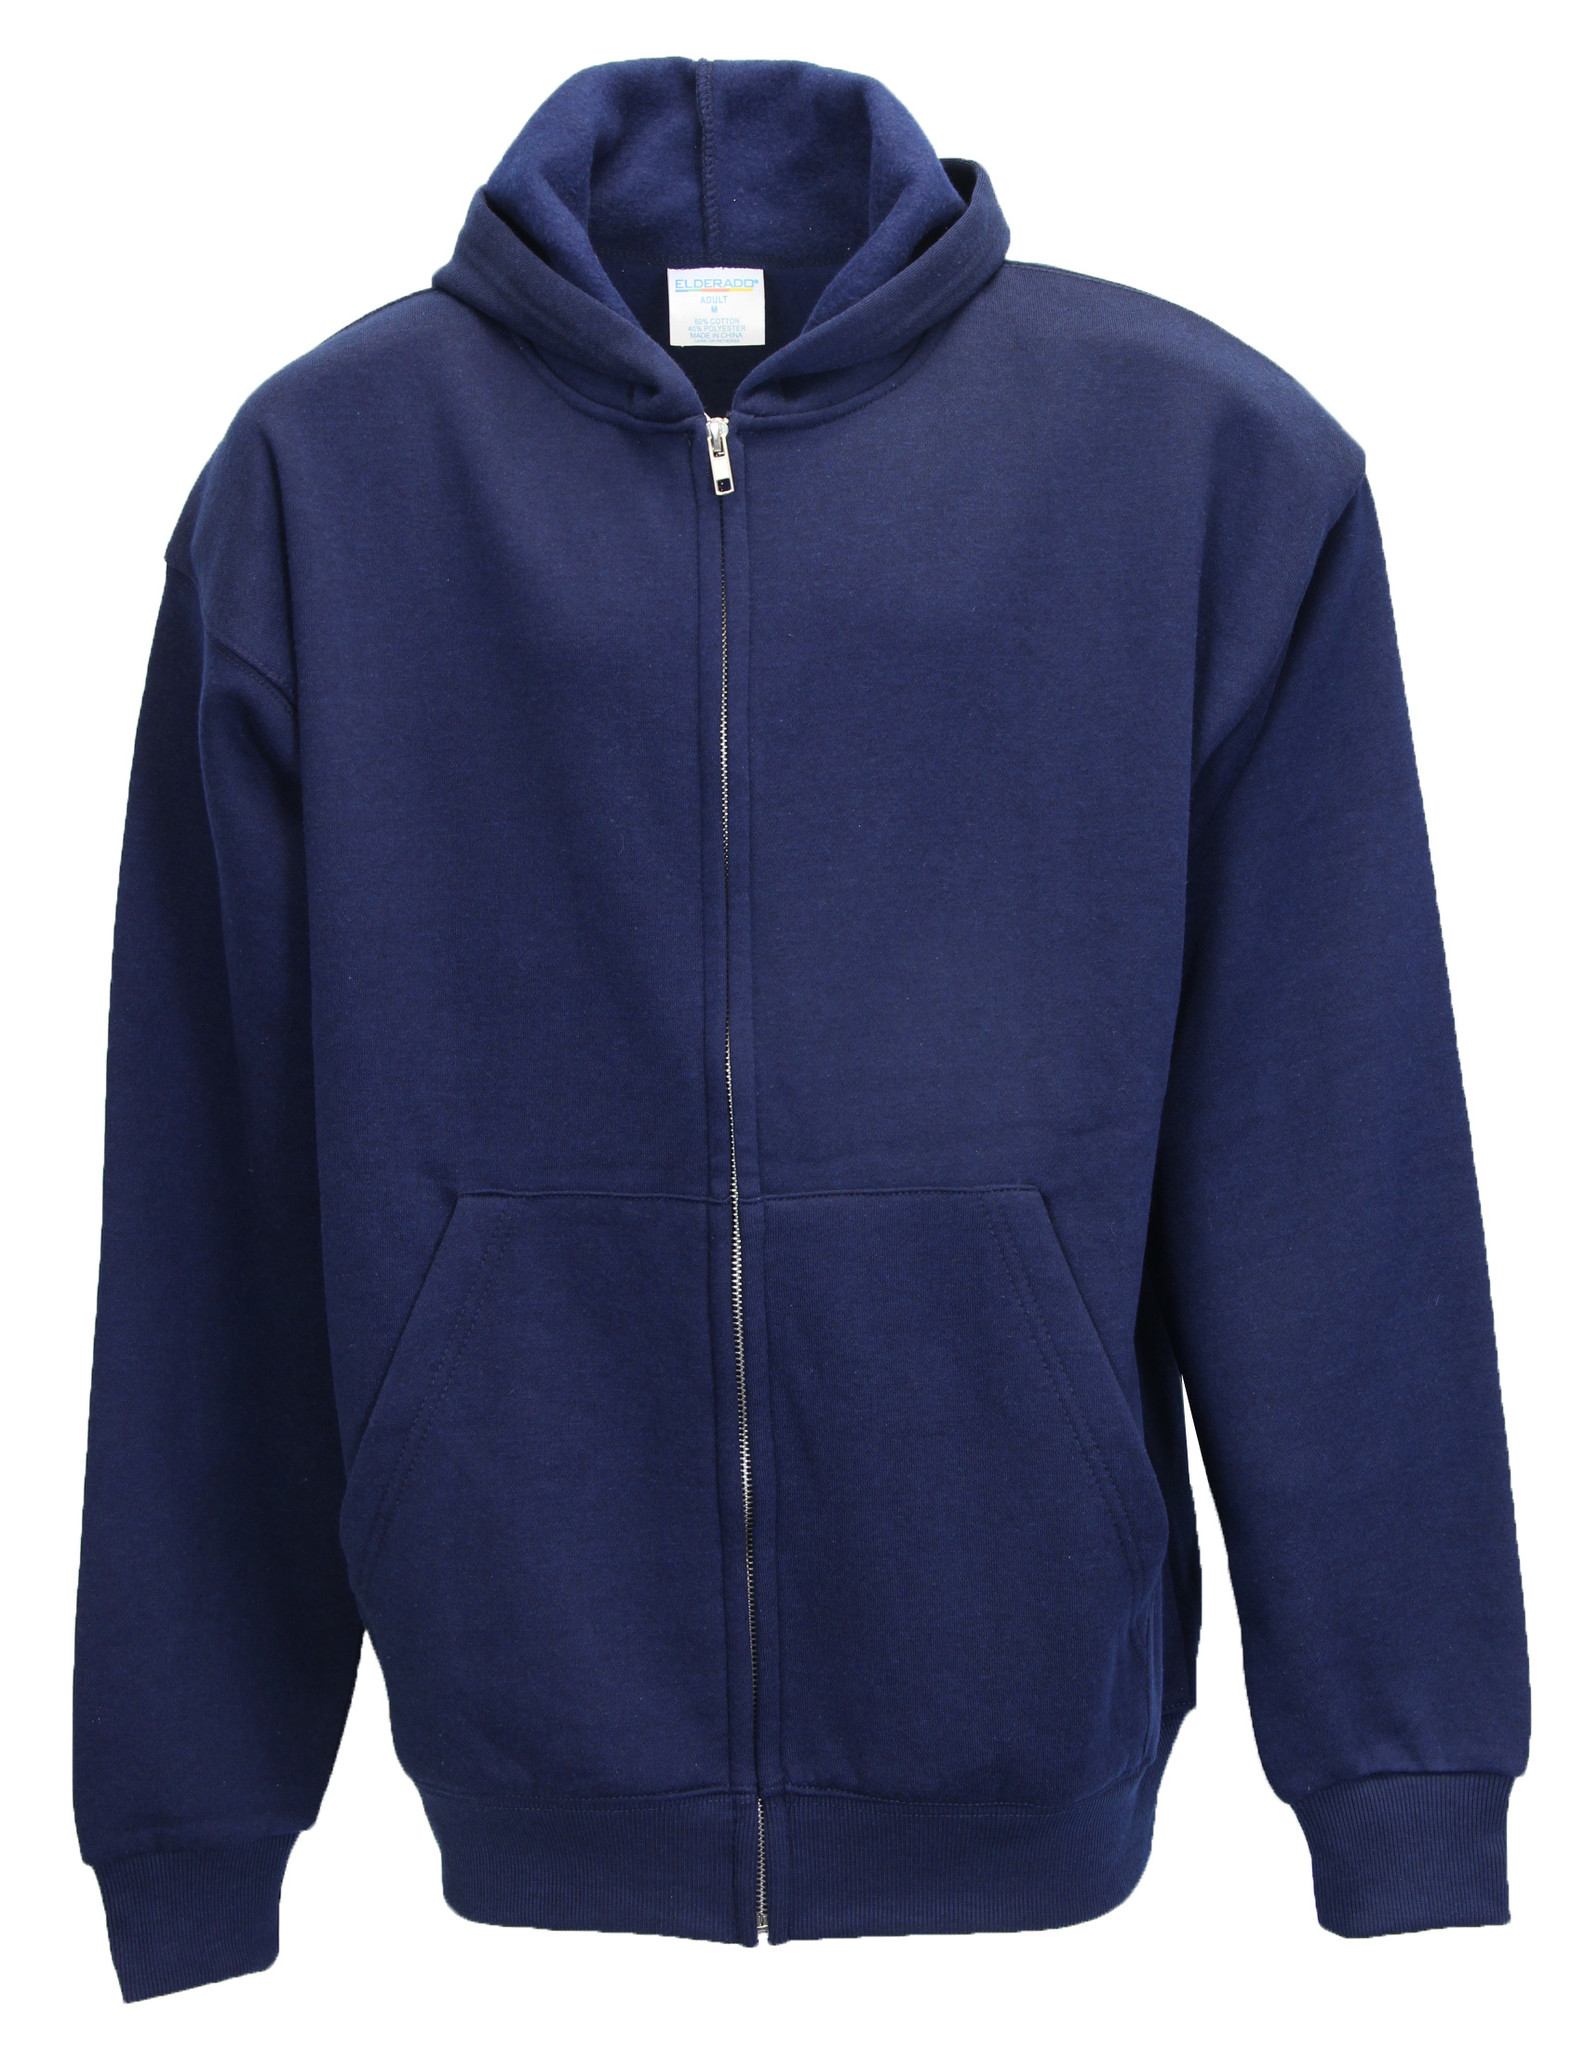 40% - Holy Family Zipper Sweatshirt (SALE)